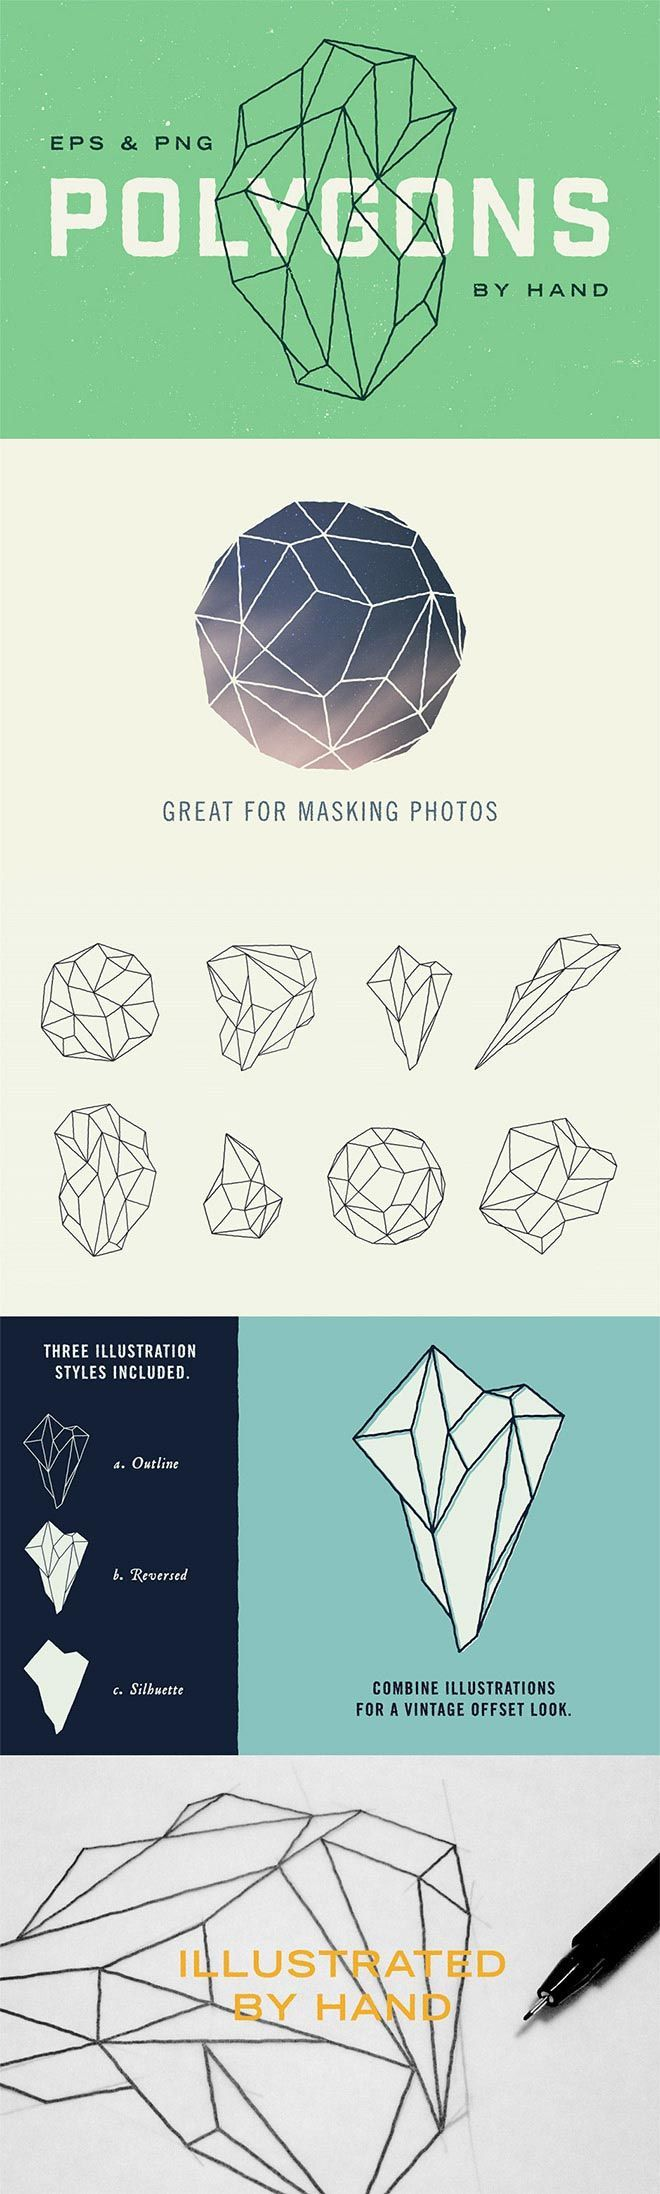 85 best Design images on Pinterest | Graph design, Graphic design ...